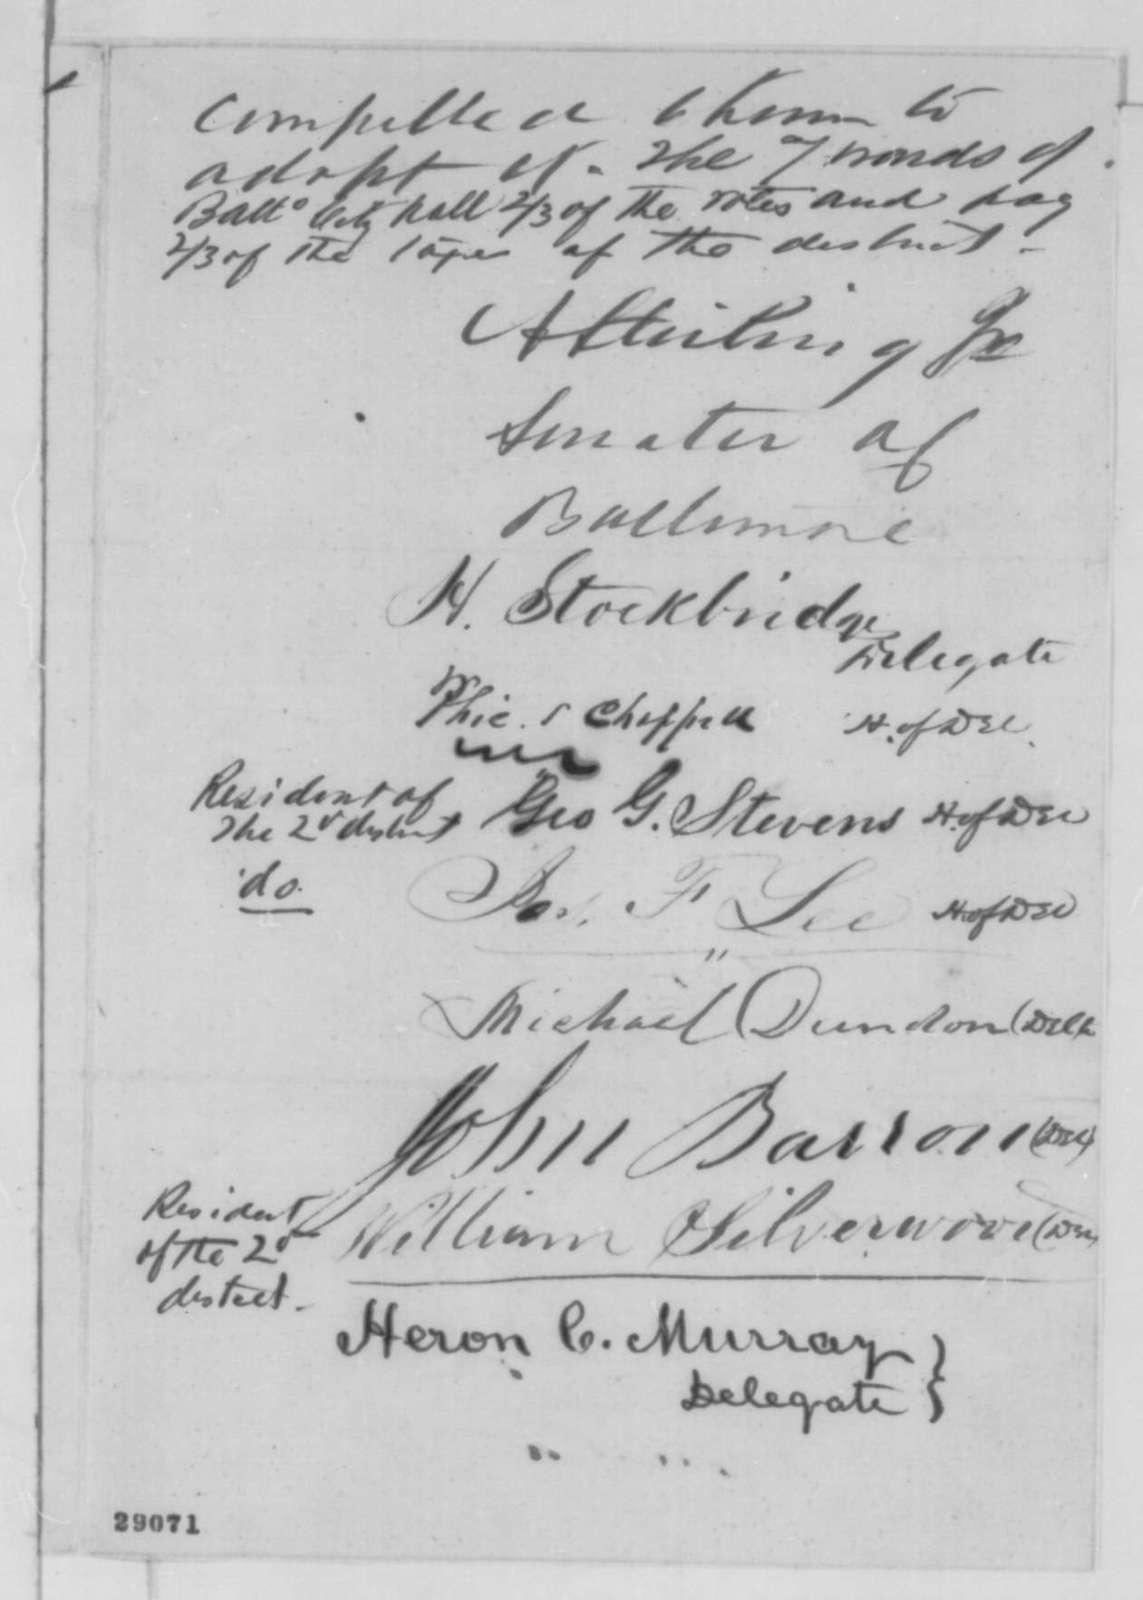 Maryland Legislature to Abraham Lincoln, December 1863  (Petition protesting removal of Joseph J. Stewart)